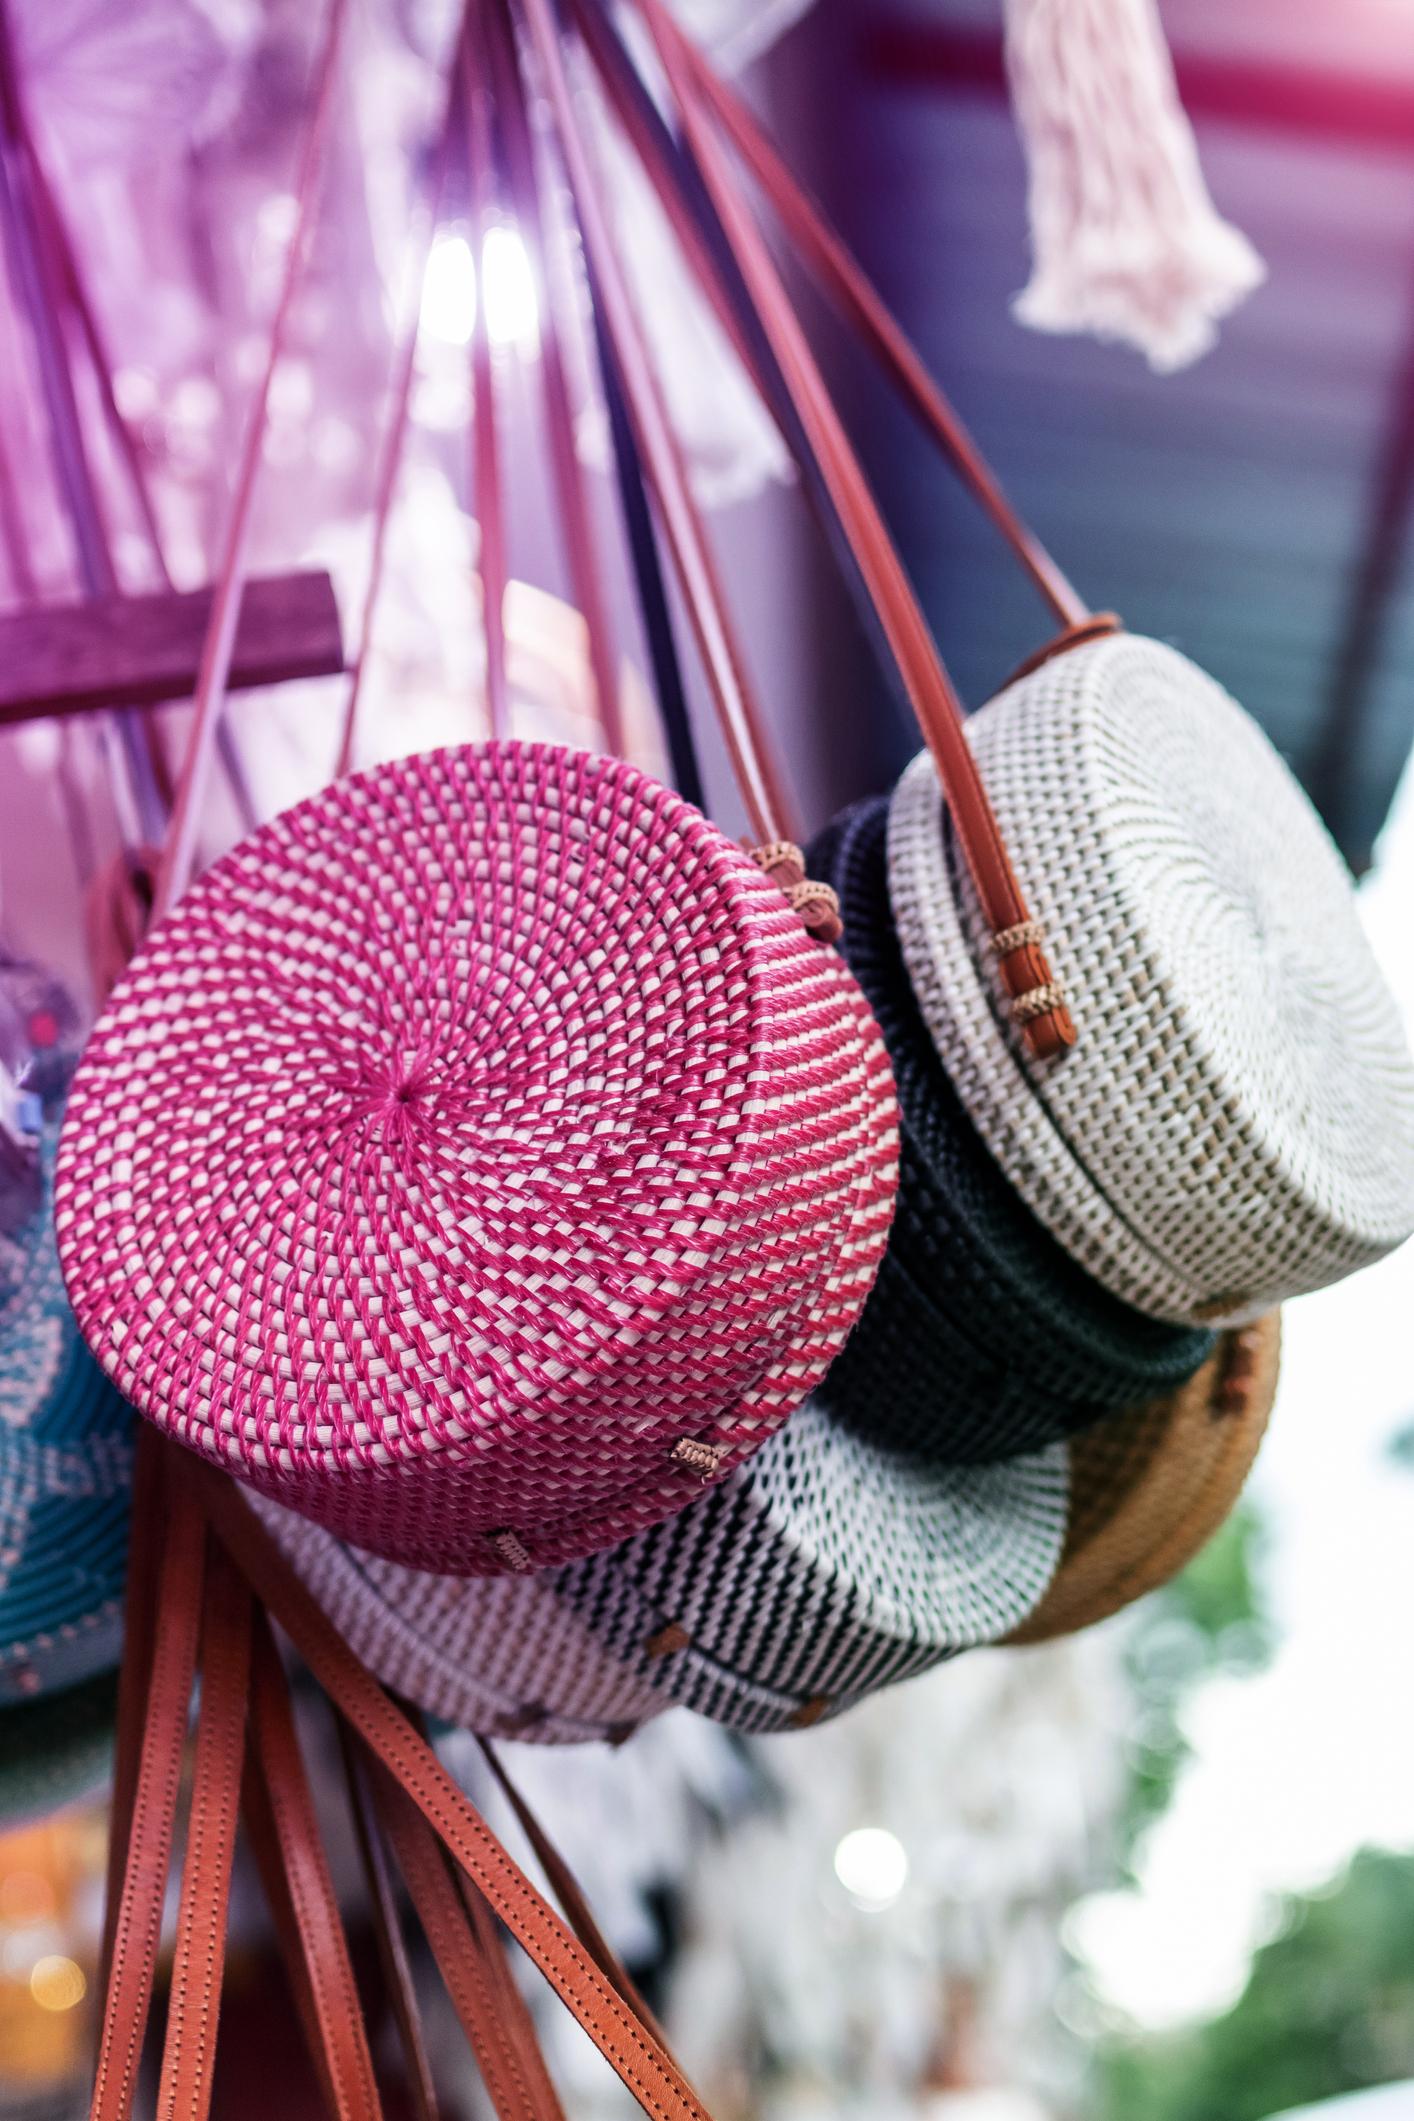 Stylish rattan handbags on the balinese street in Ubud